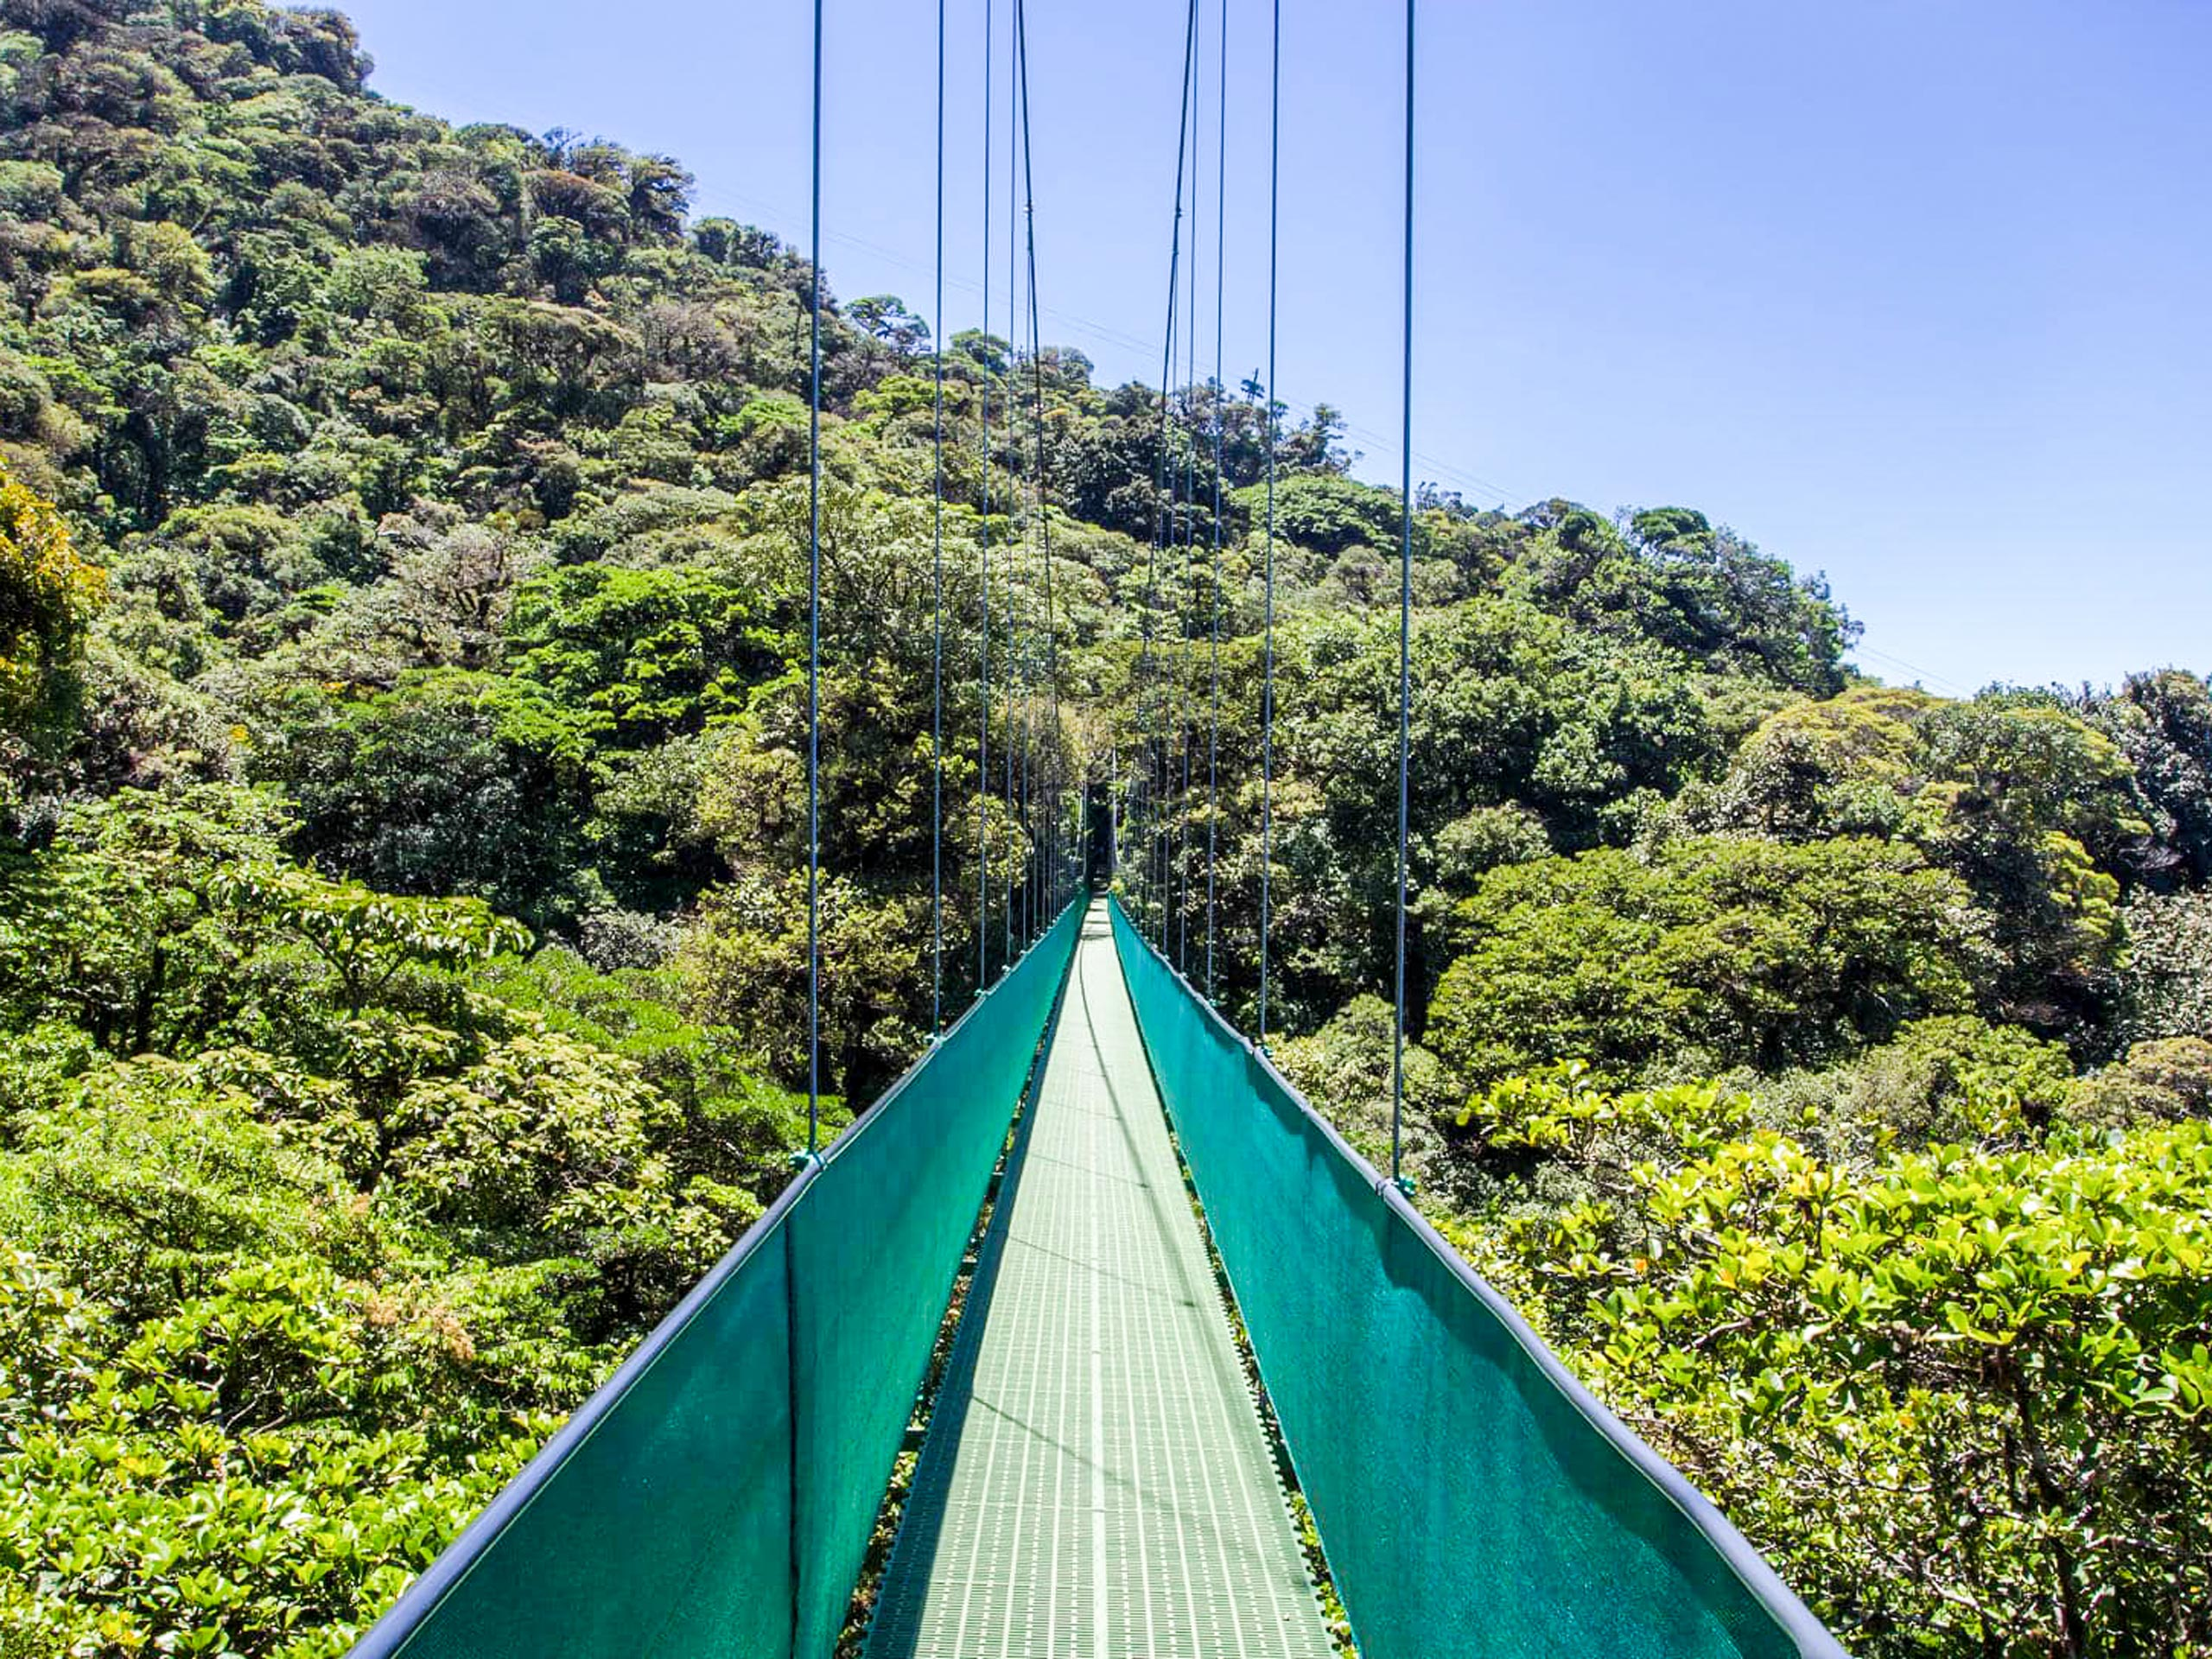 Hanging bridge for a sky walk